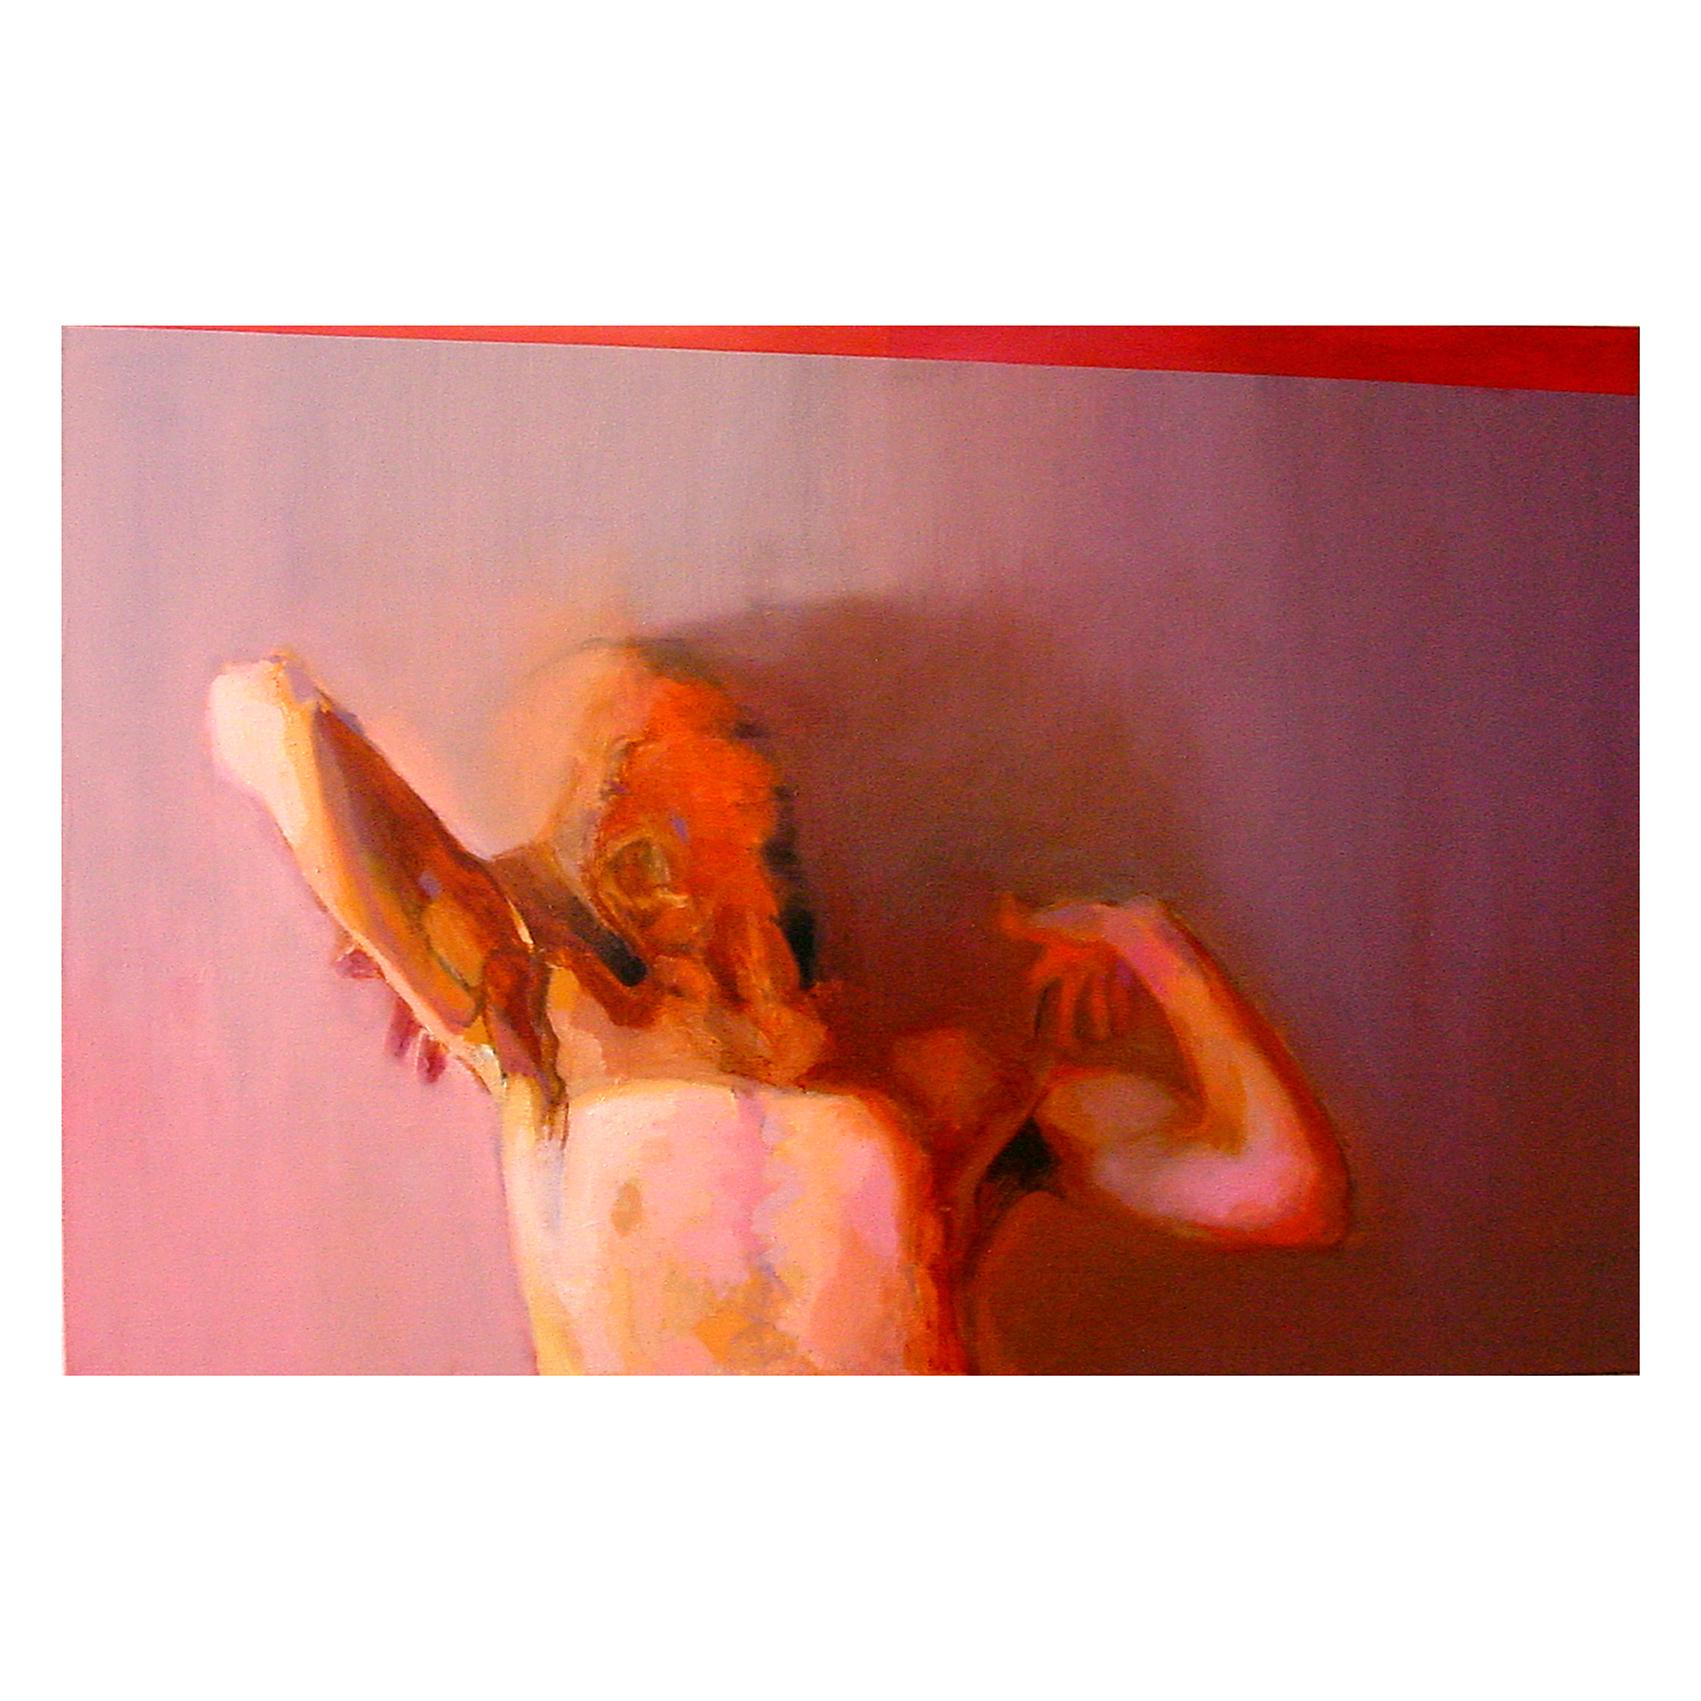 scream_2A_sqr.jpg